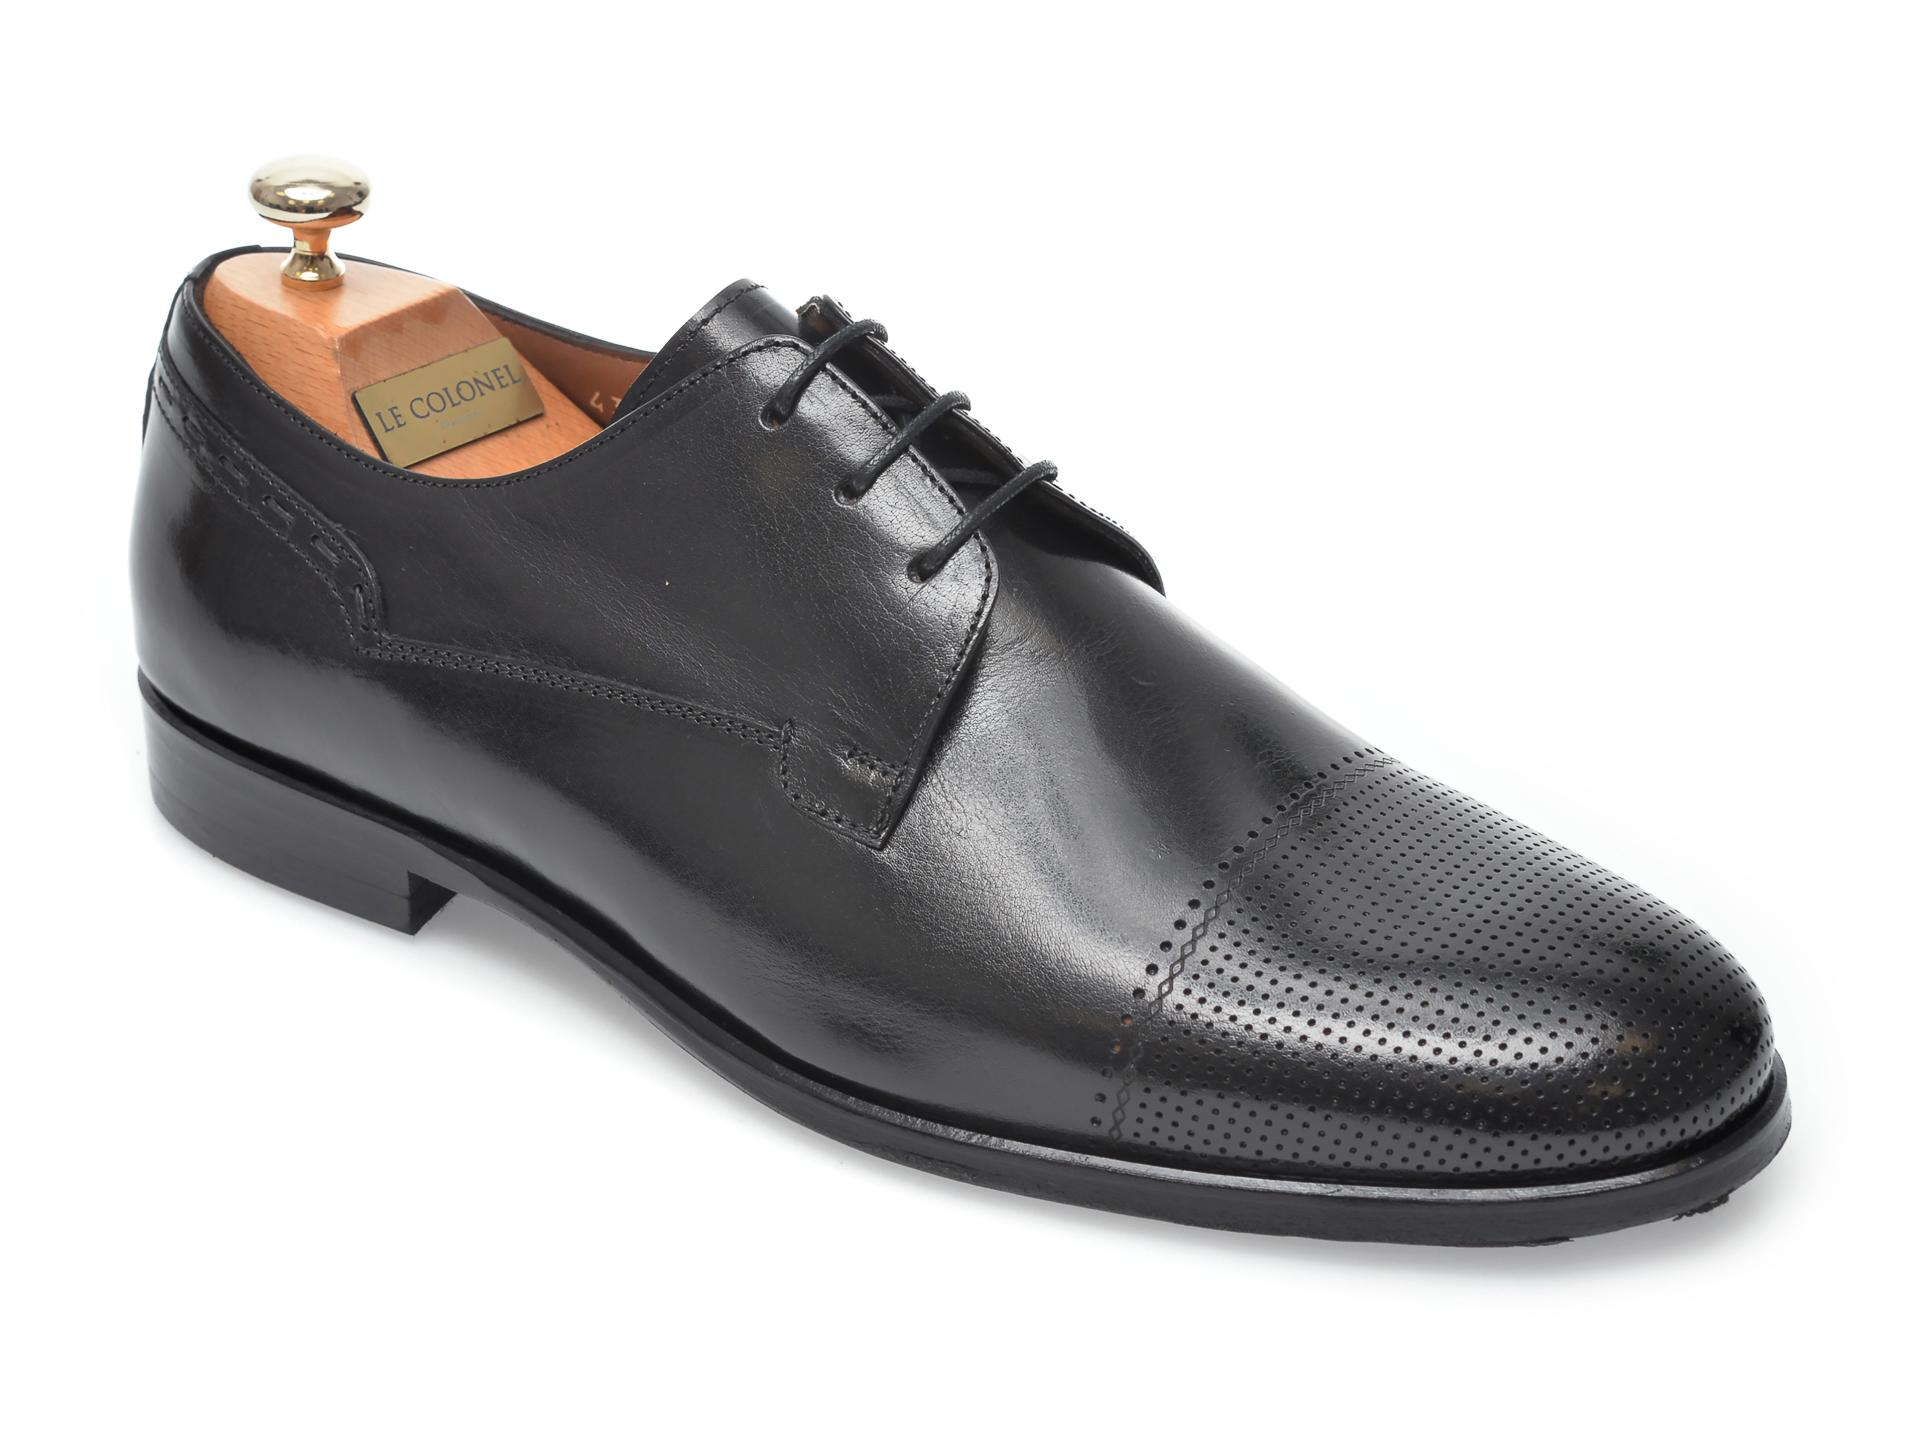 Pantofi LE COLONEL negri, 60517, din piele naturala imagine